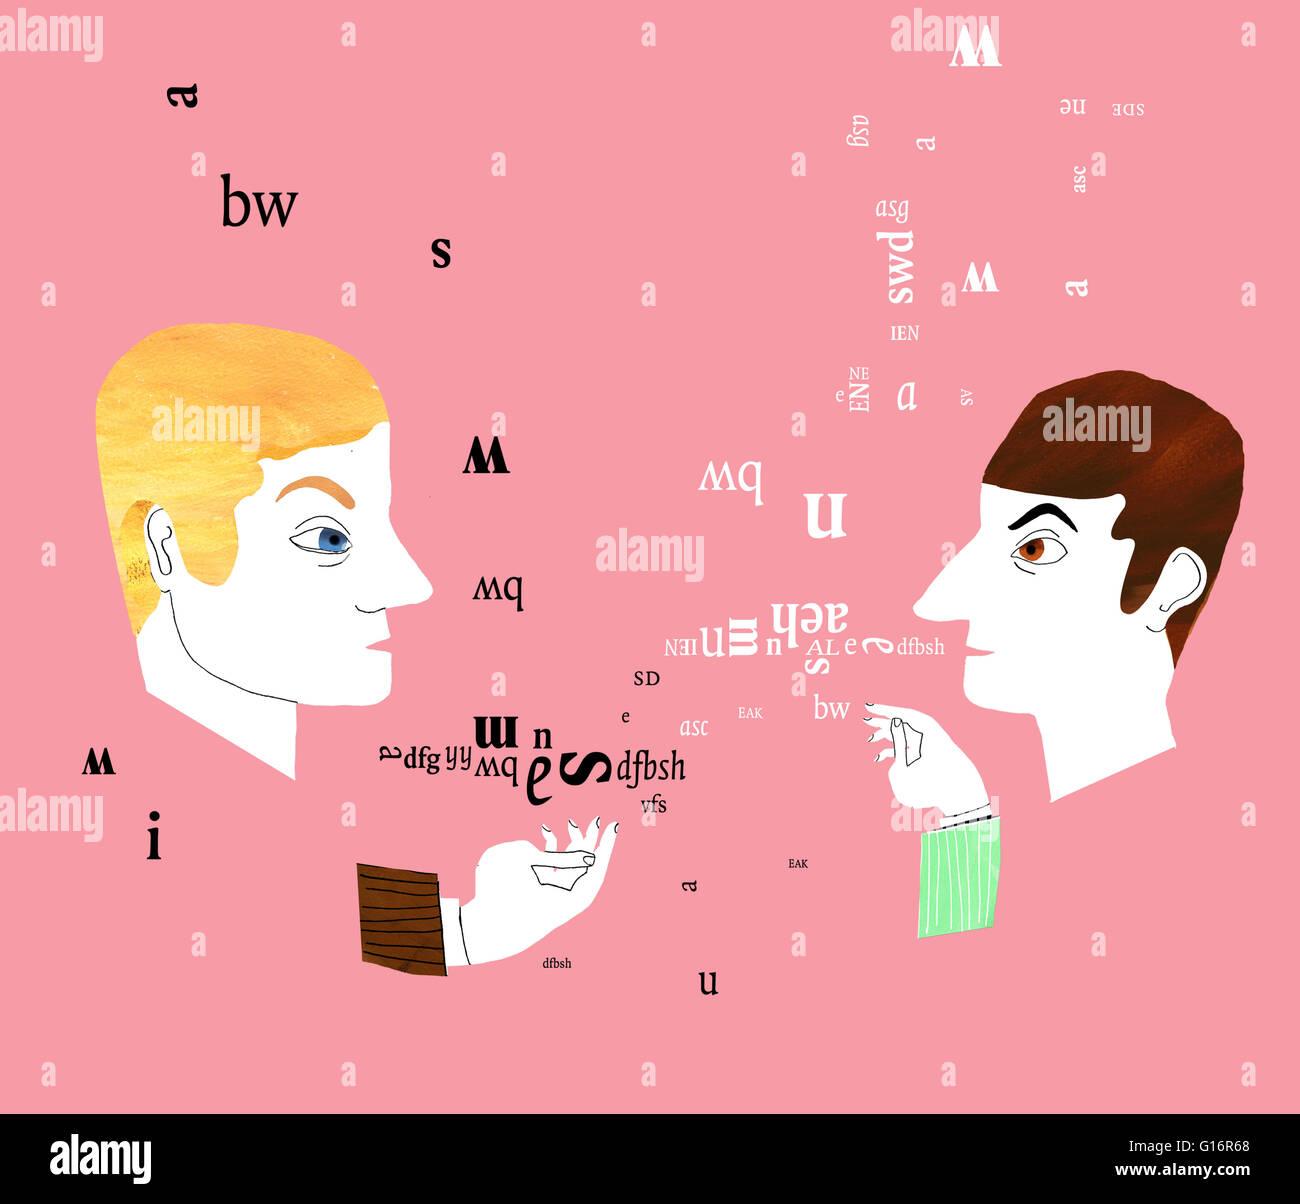 two men having a miscommunication - Stock Image